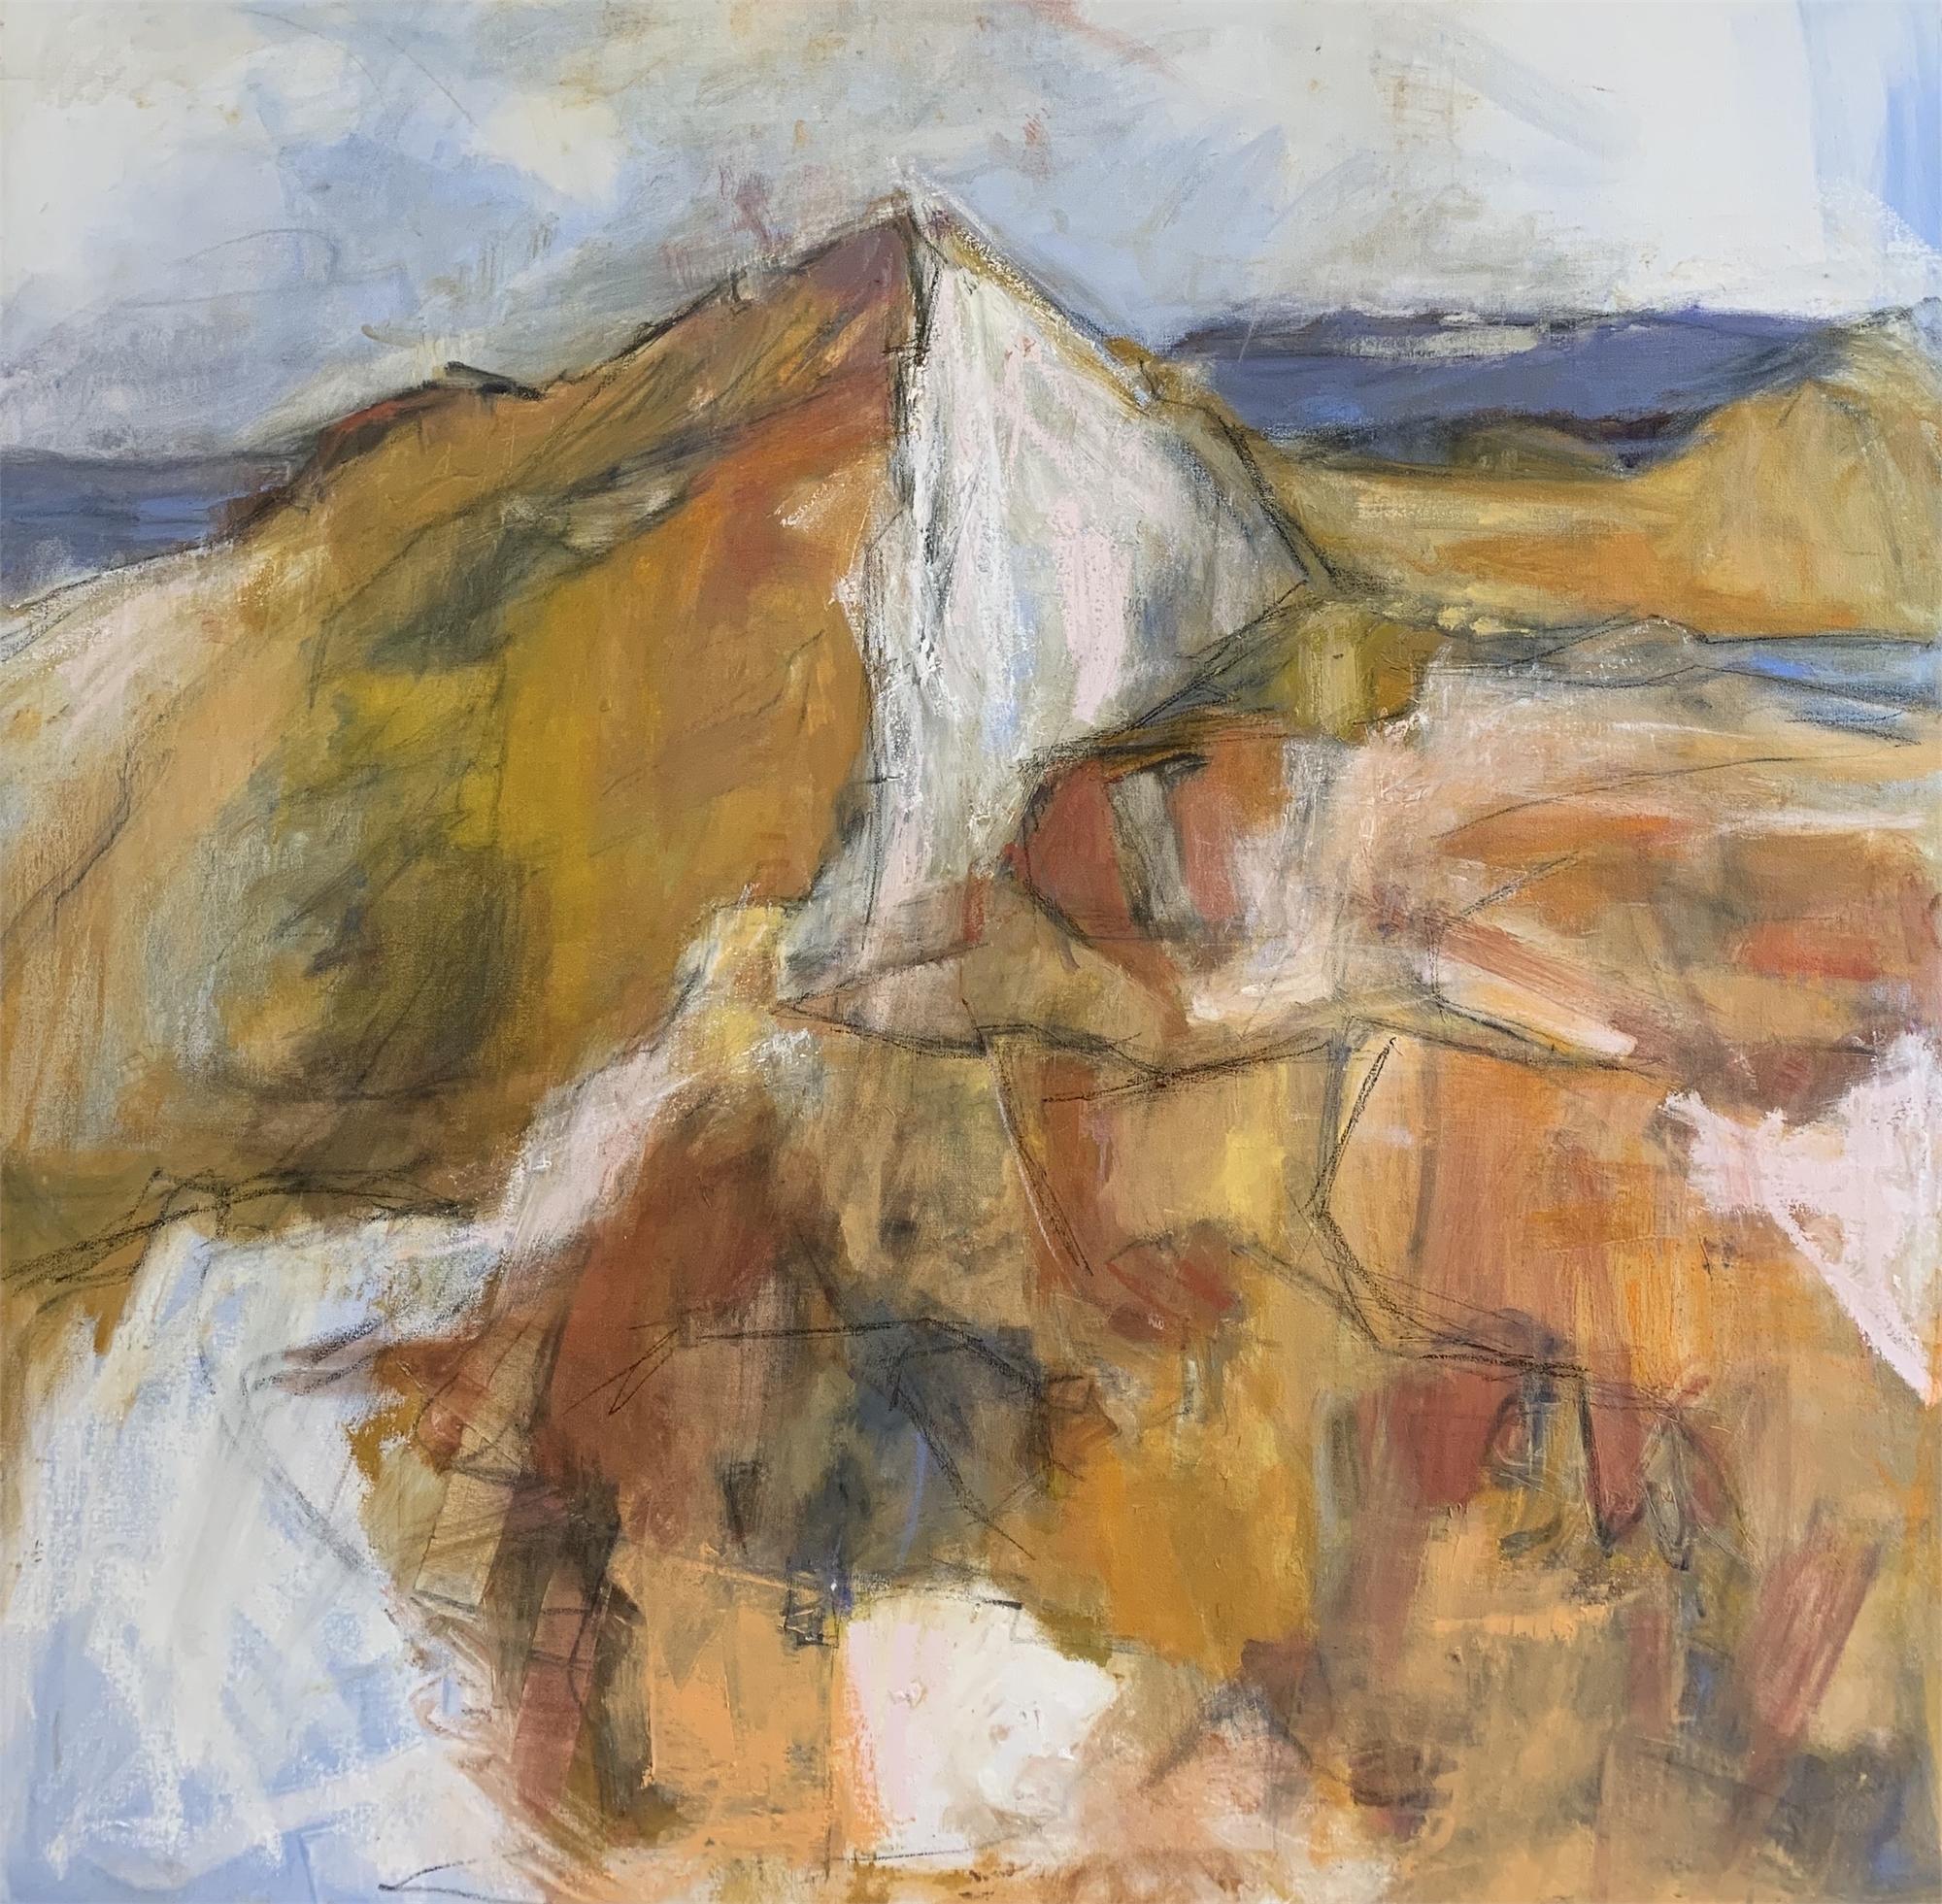 Climb Every Mountain by Susan Altman